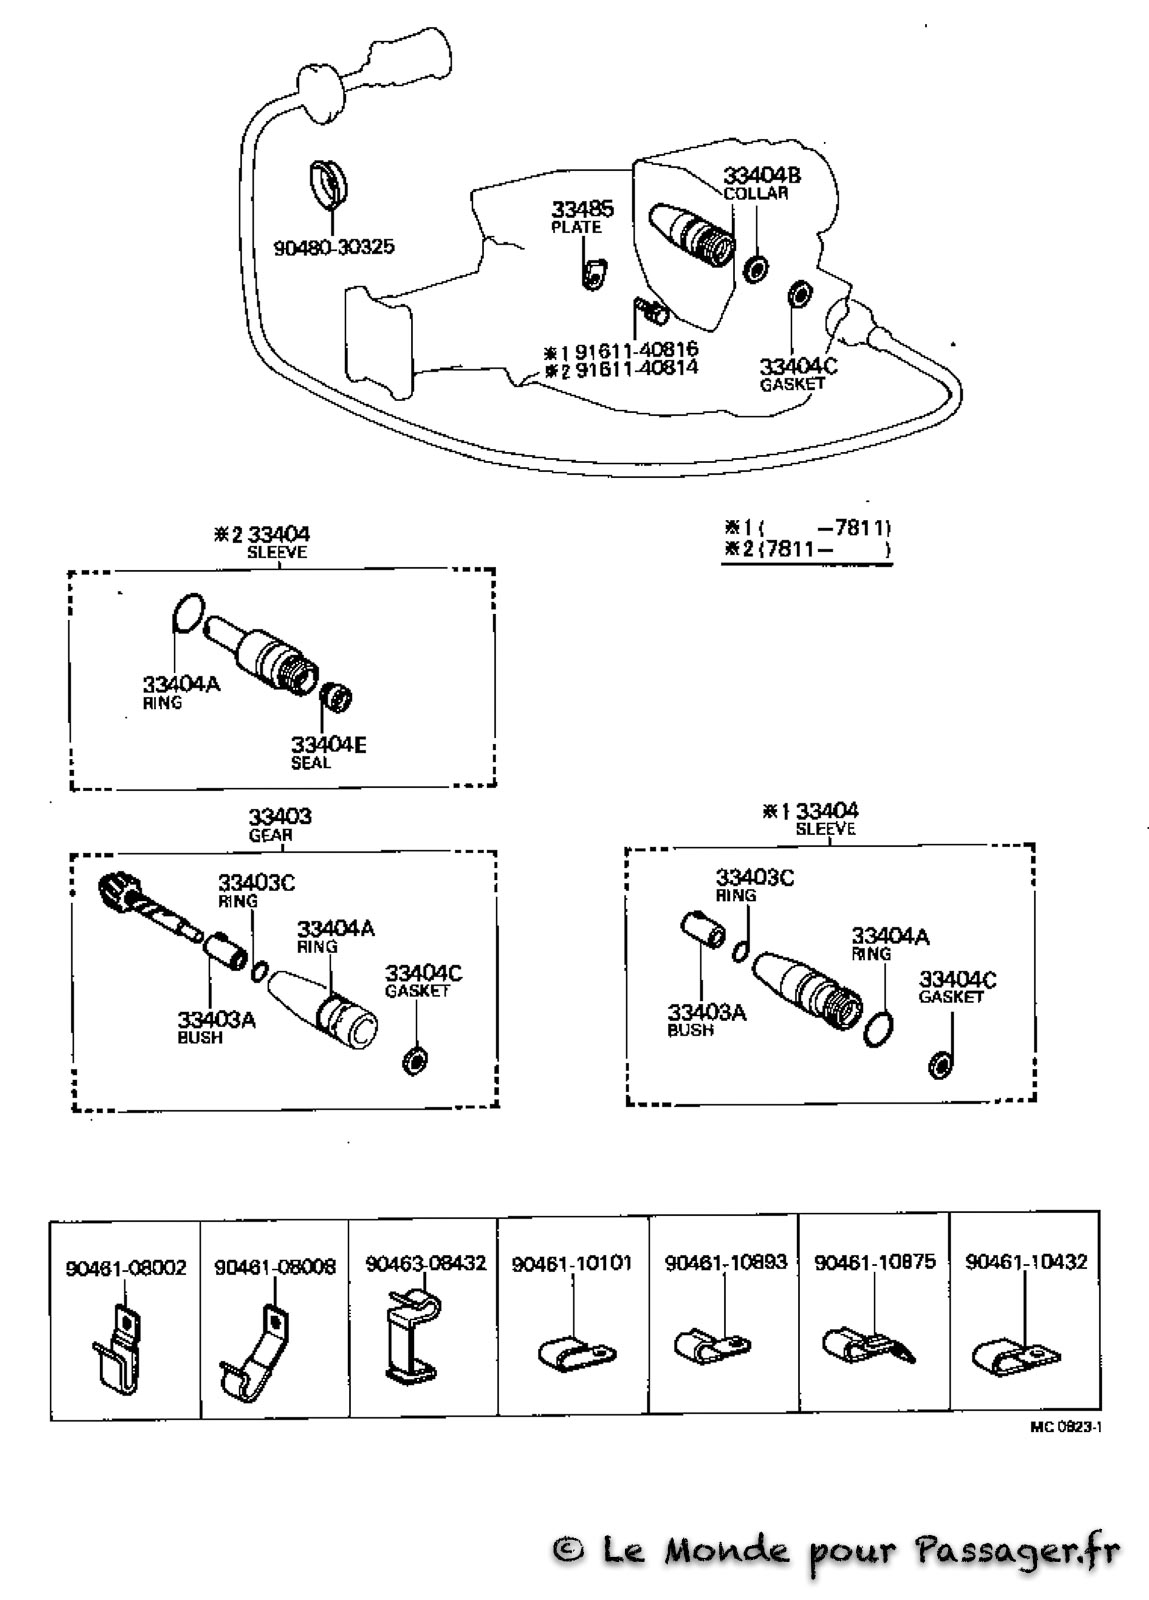 Fj55-Eclatés-Techniques089